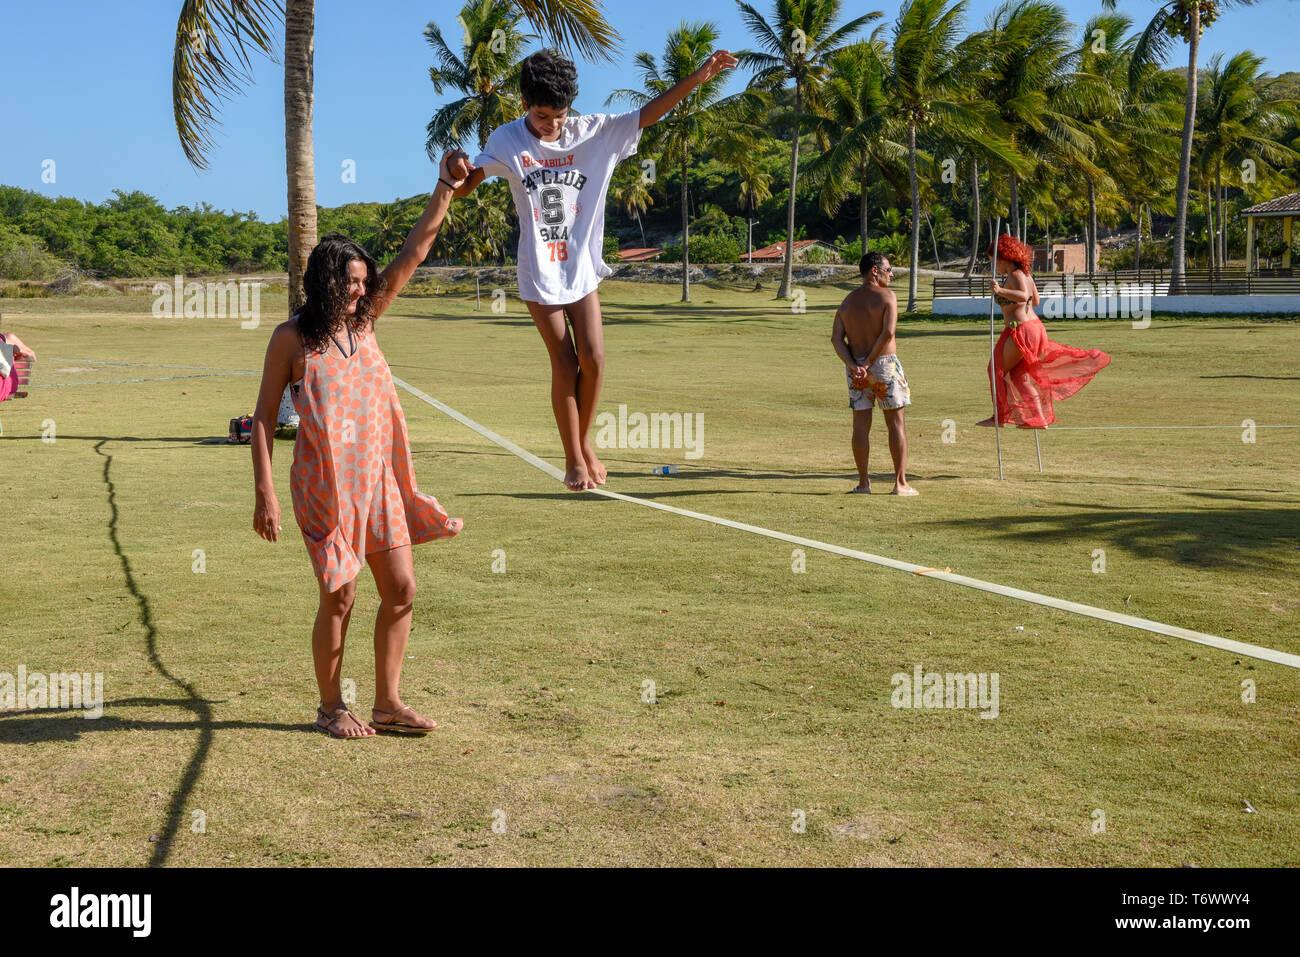 Pipa, Brazil - 23 January 2019: Woman on tightrope walker training near Pipa on Brazil - Stock Image